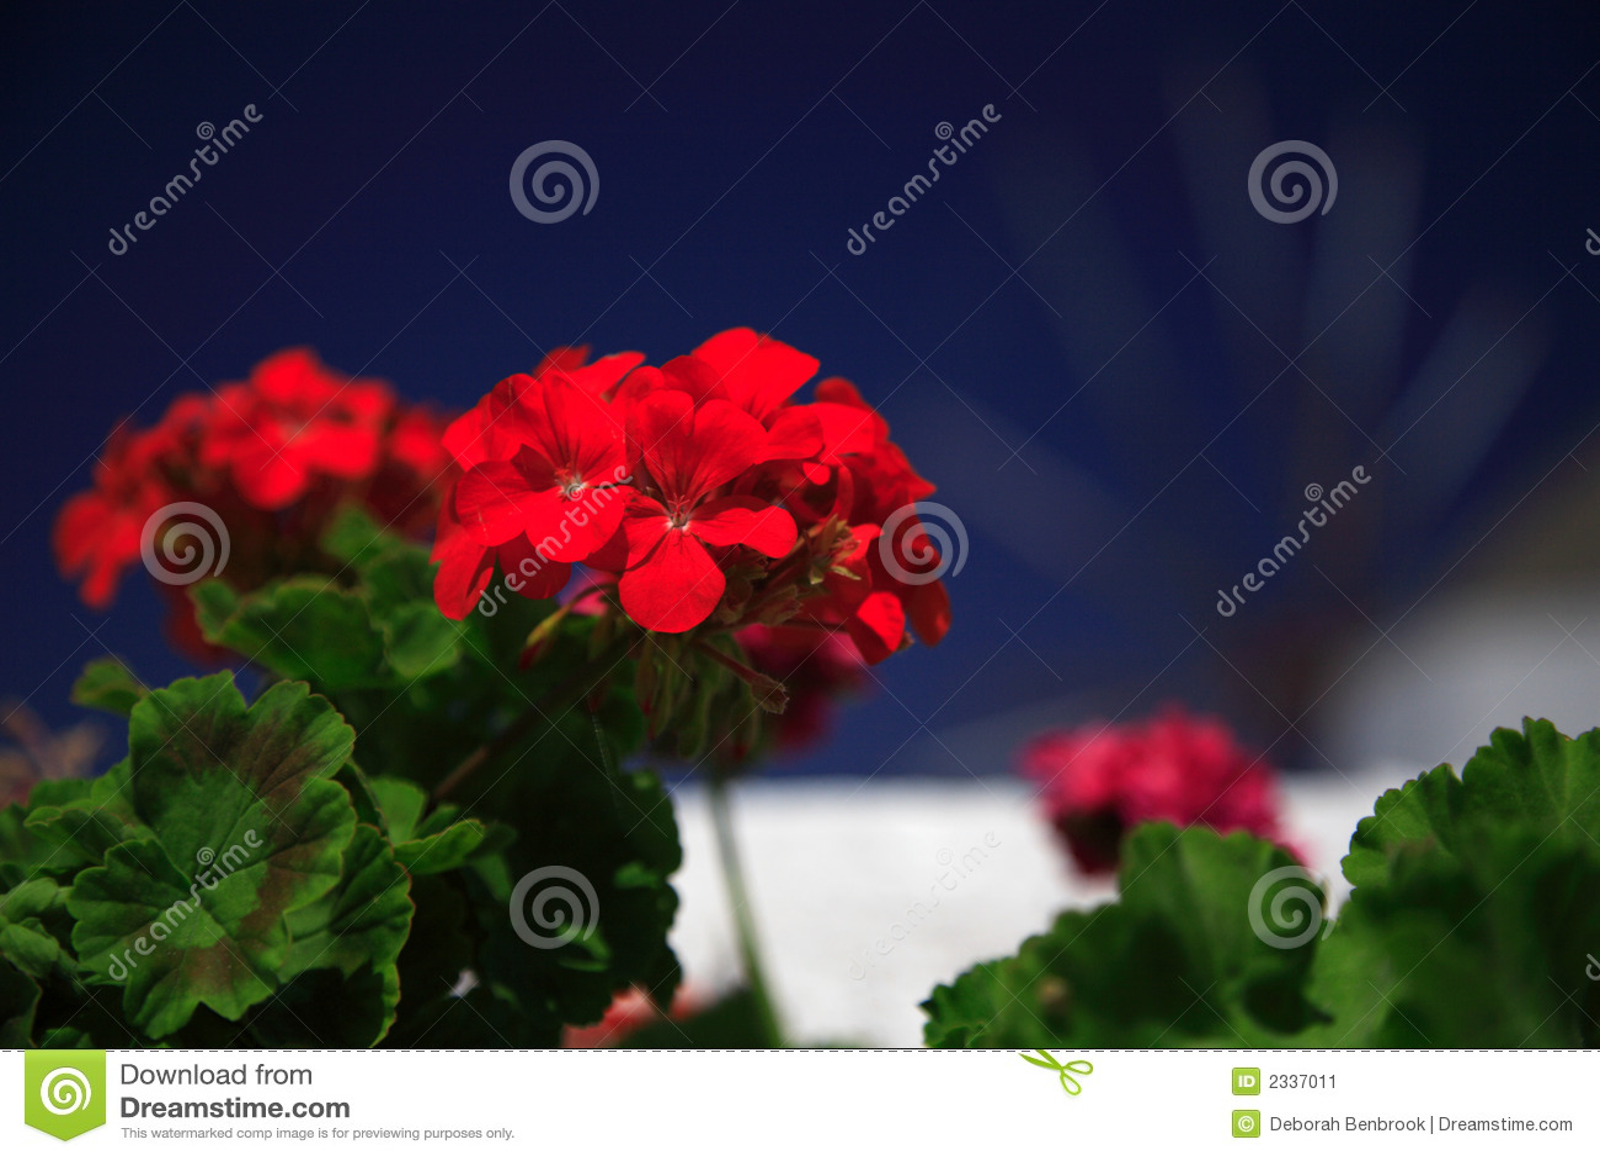 Red Geranium Close Up Stock Image - Image: 2337011